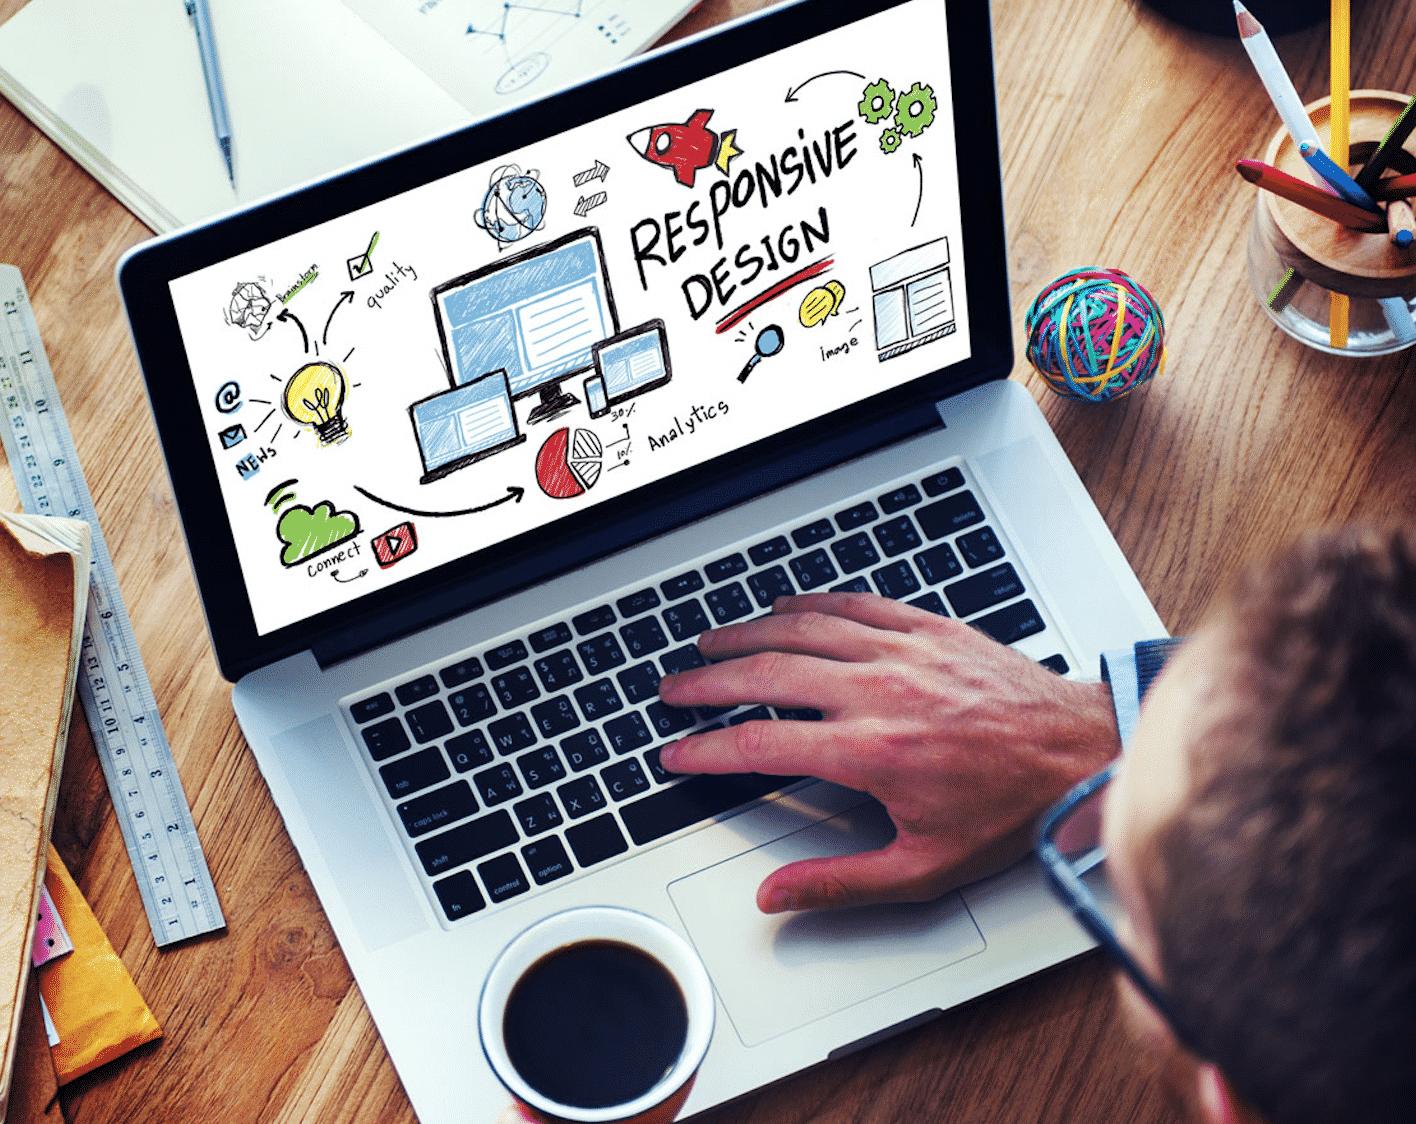 Design Requirements For Websites 2020